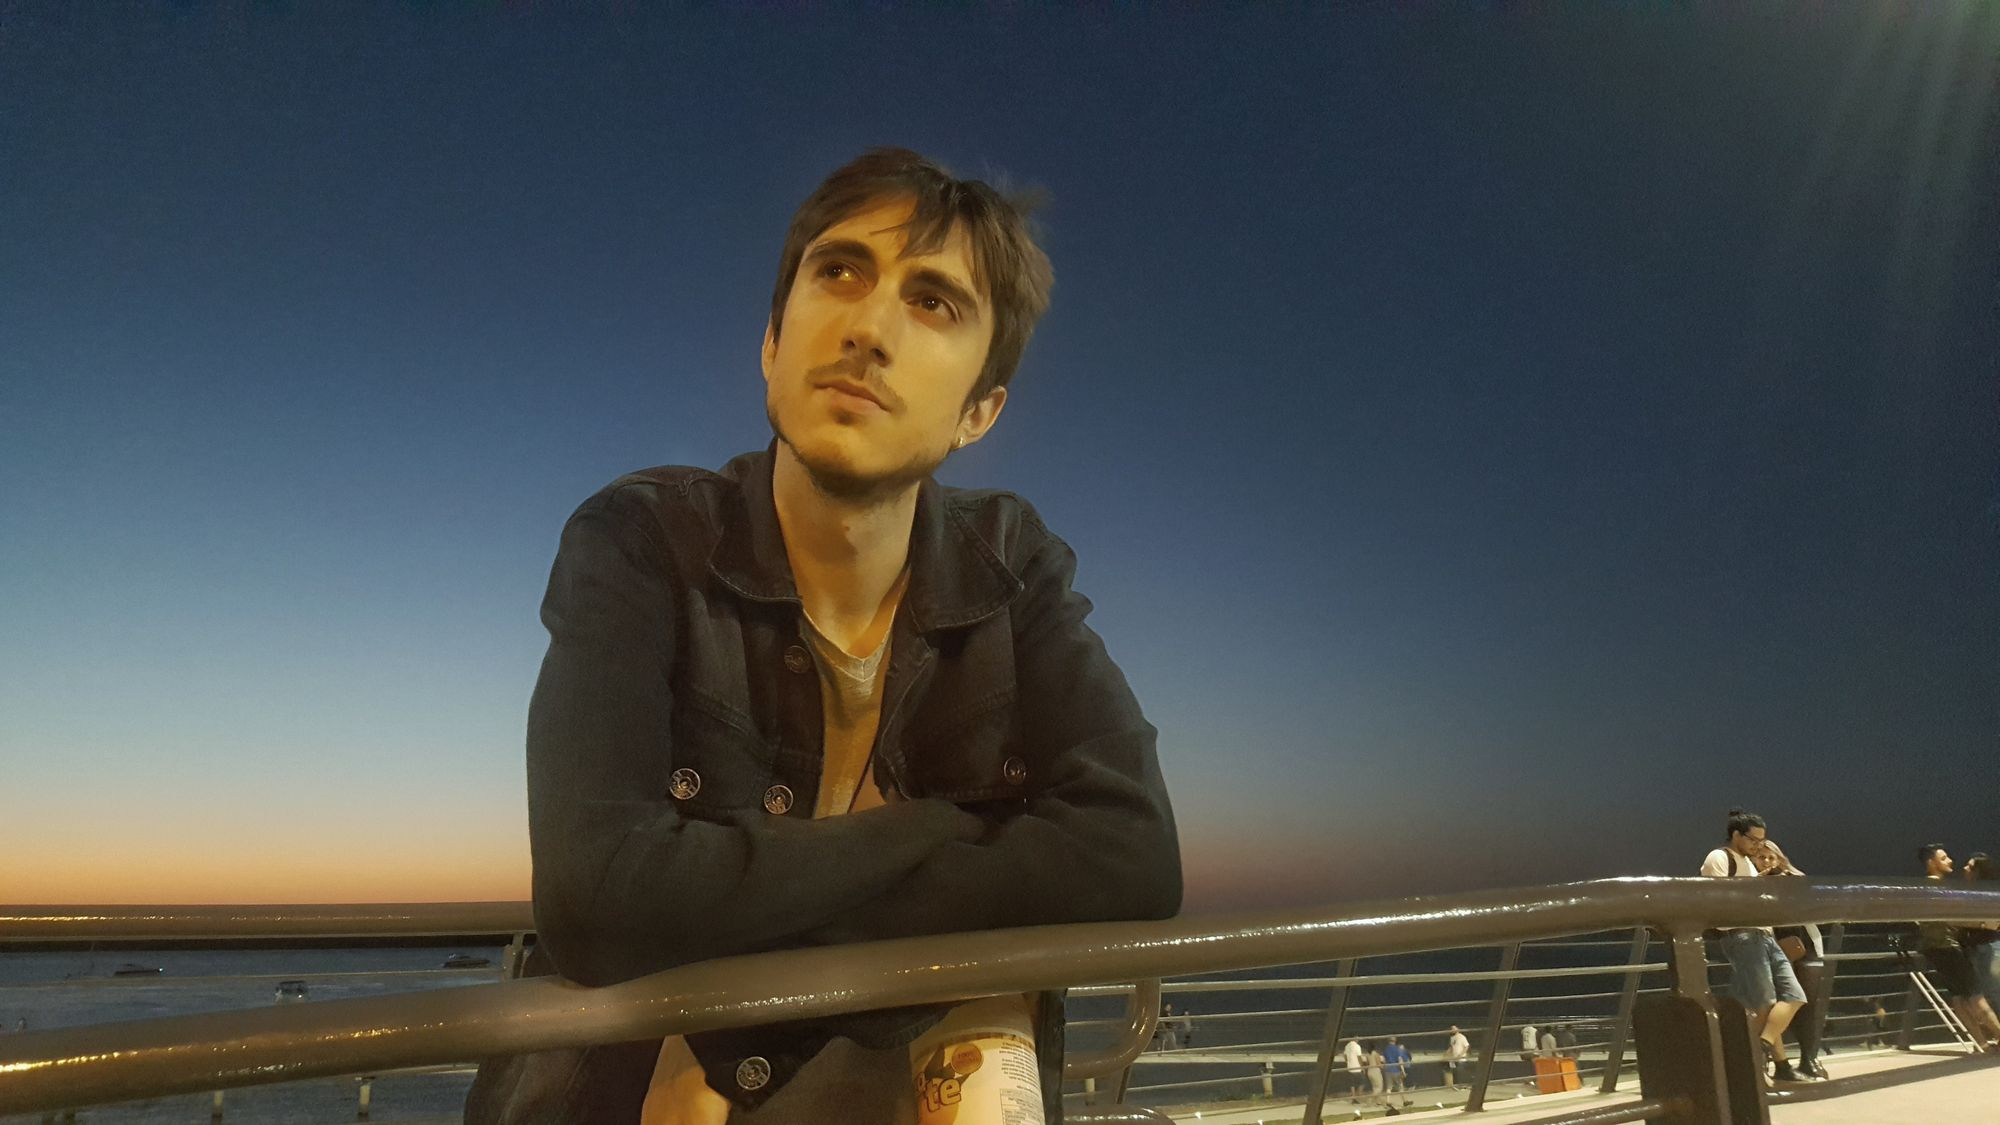 Vitor Vanacor